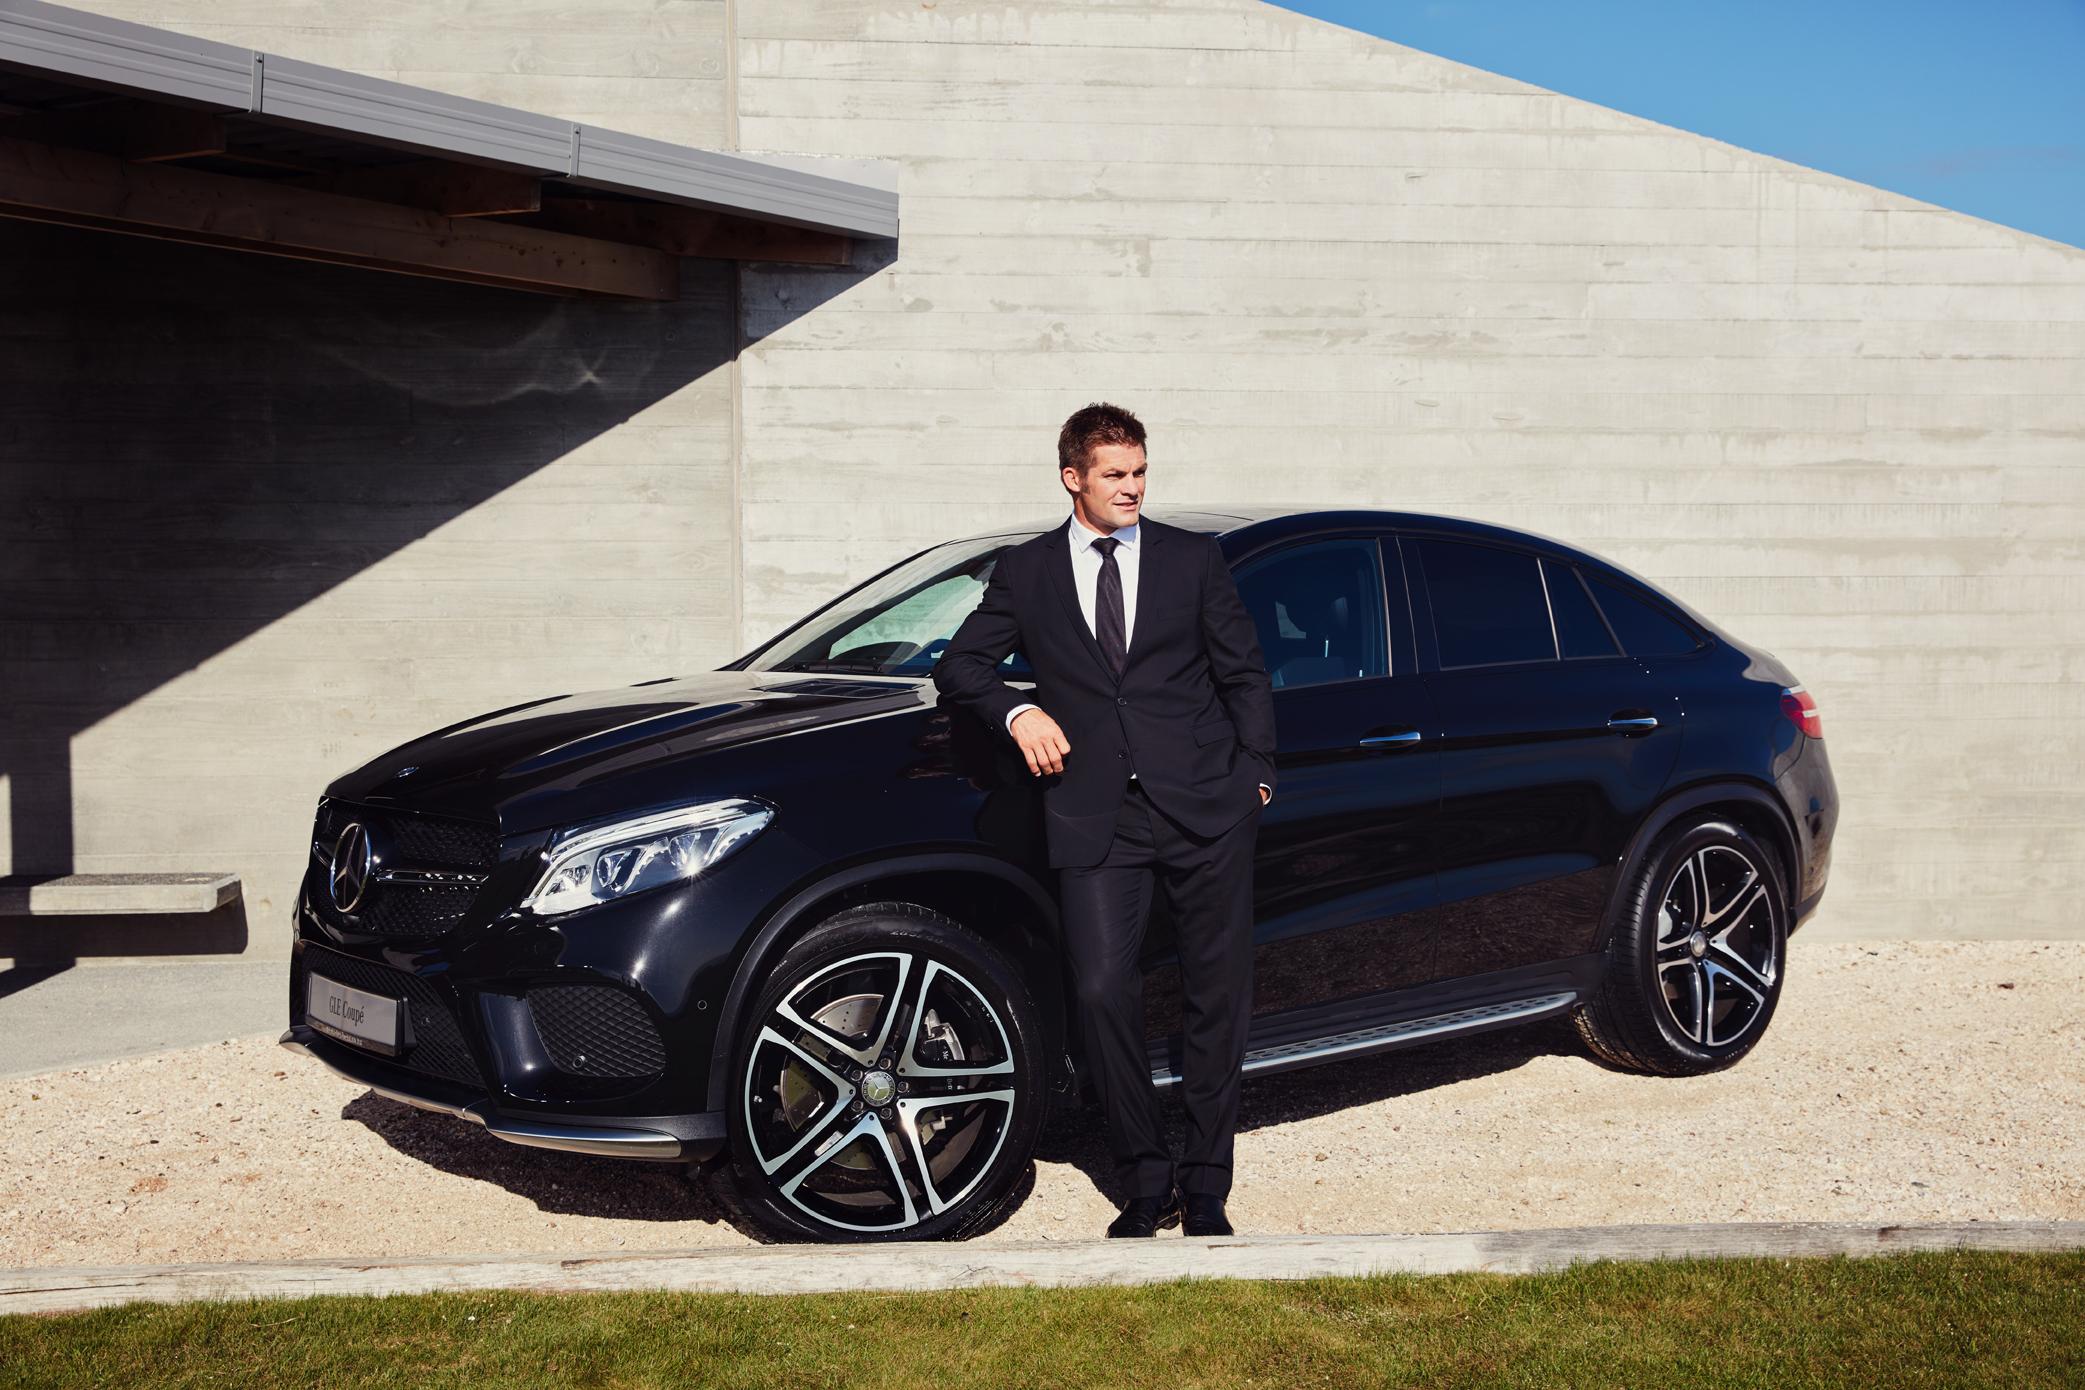 Mercedes-Benz Ambassador Campaign - Richie McCaw